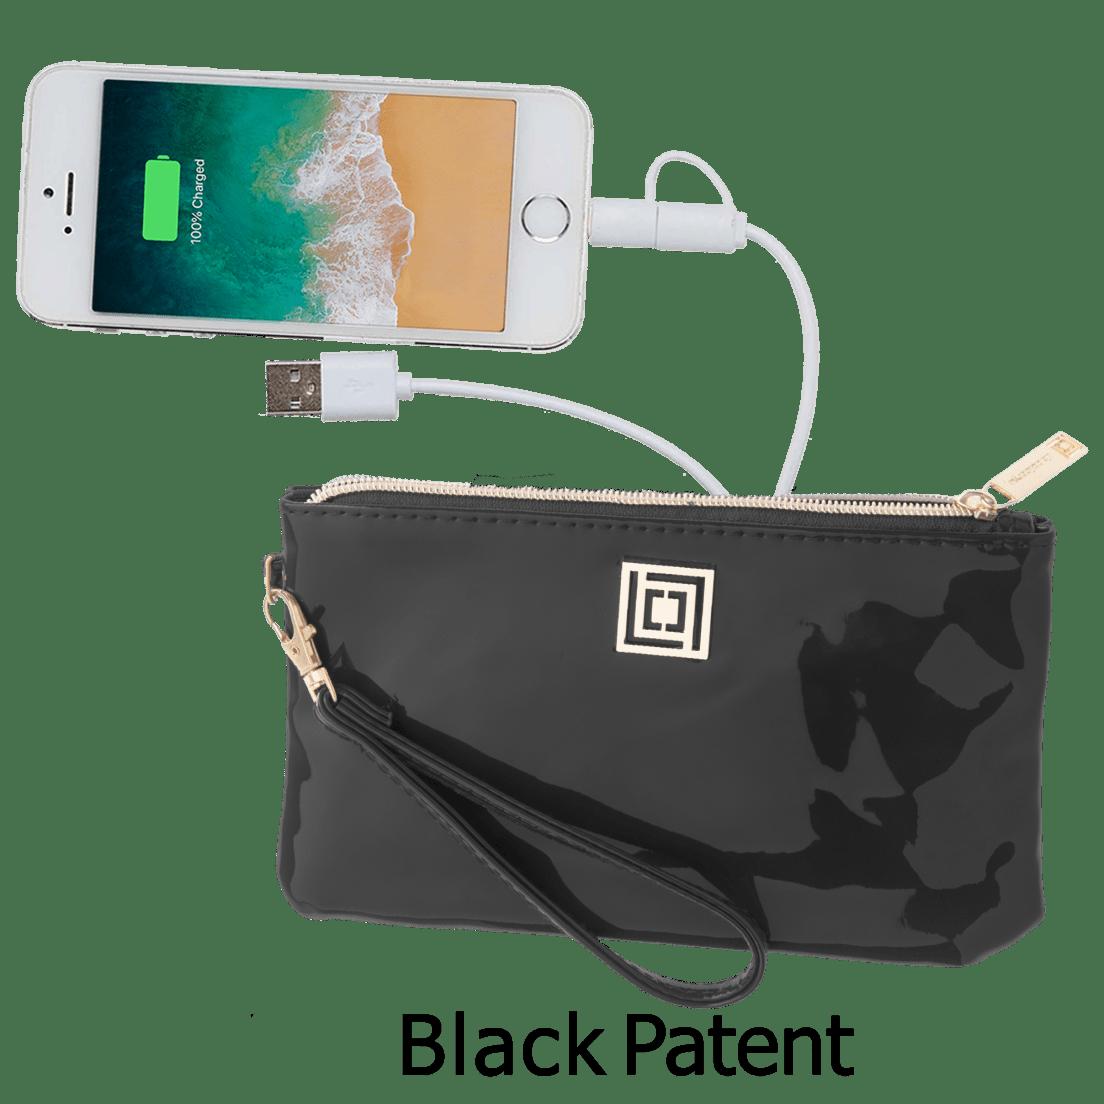 67b7ba71977ba Black Patent Phone Charging Wristlets w RFID Theft Protection by Liz  Claiborne